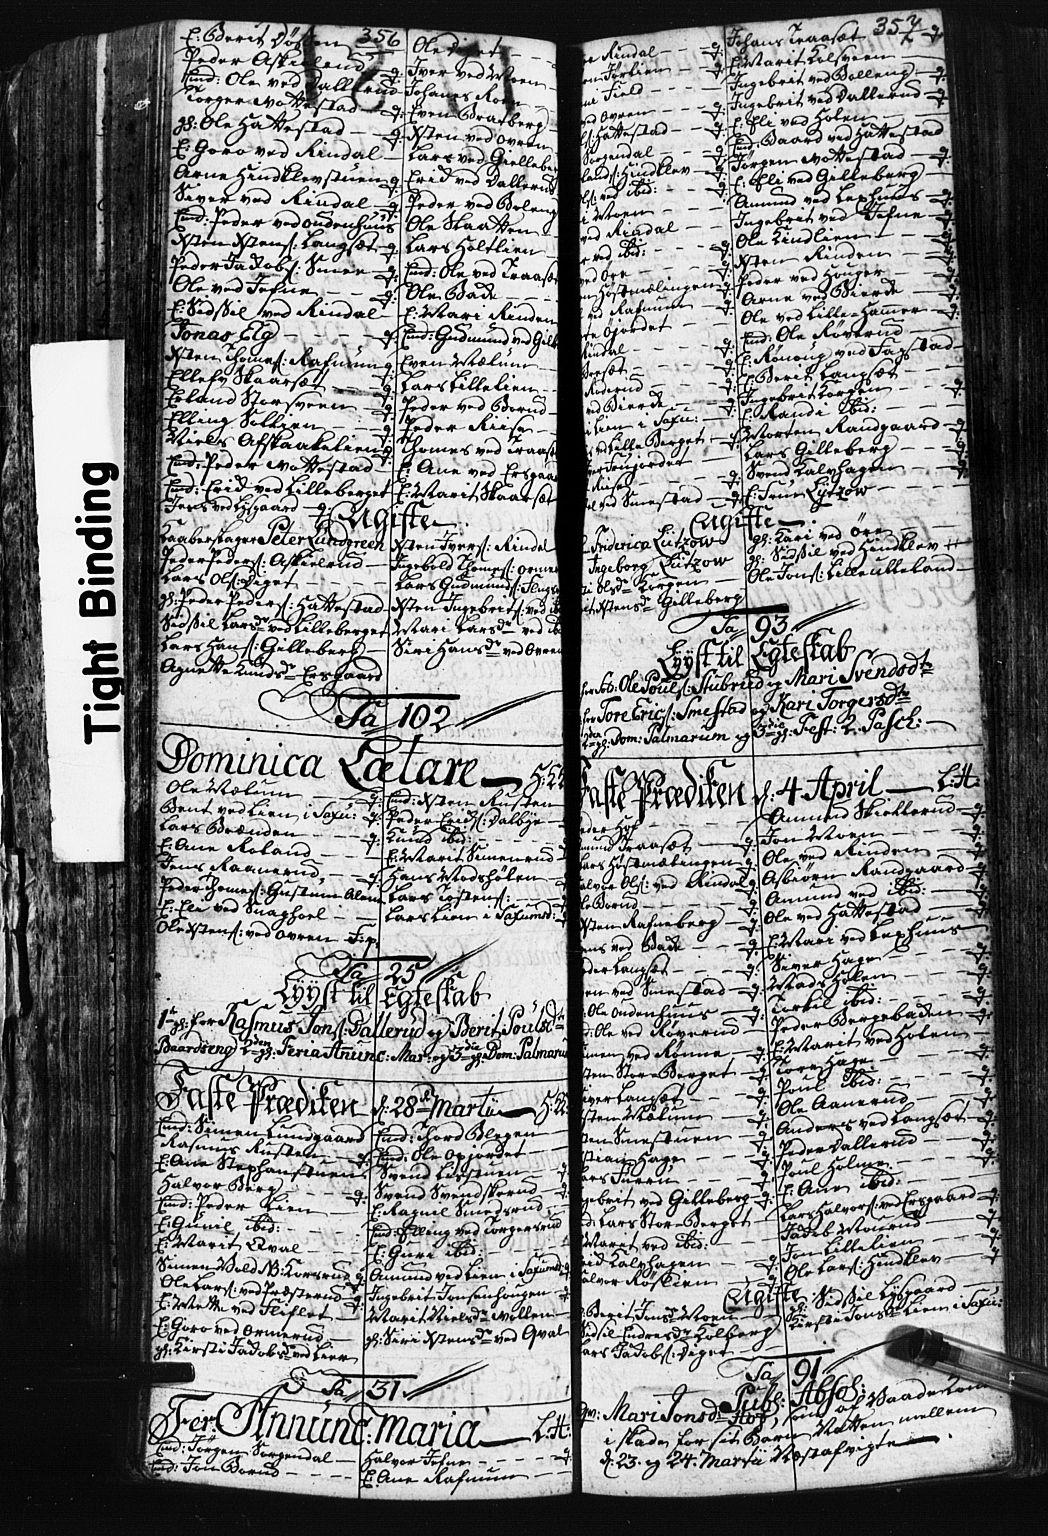 SAH, Fåberg prestekontor, Klokkerbok nr. 3, 1768-1796, s. 356-357